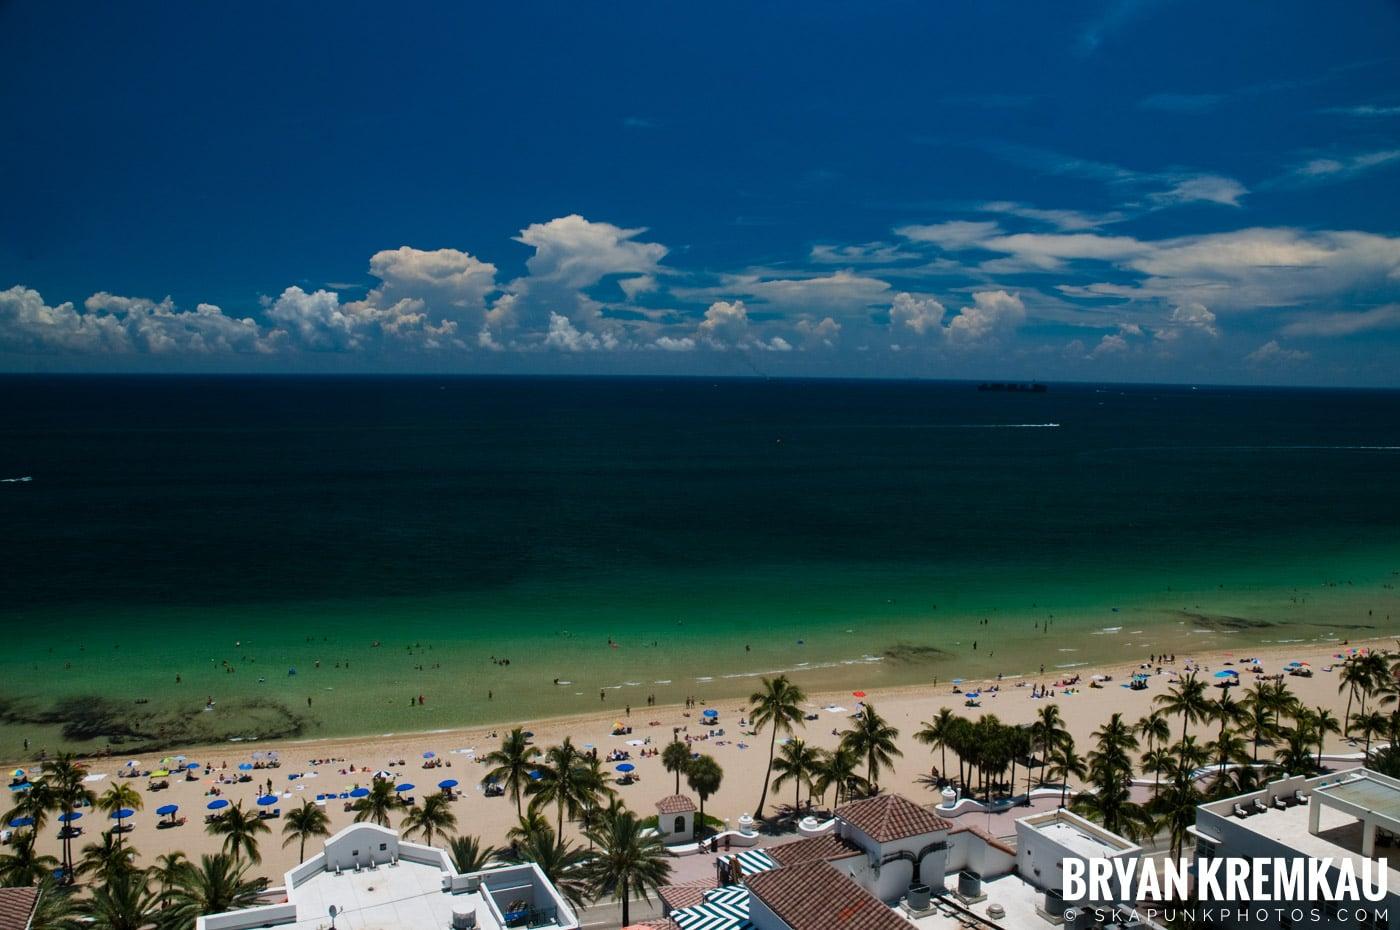 Florida Keys Vacation - 7.09.10 - 7.15.10 (110)